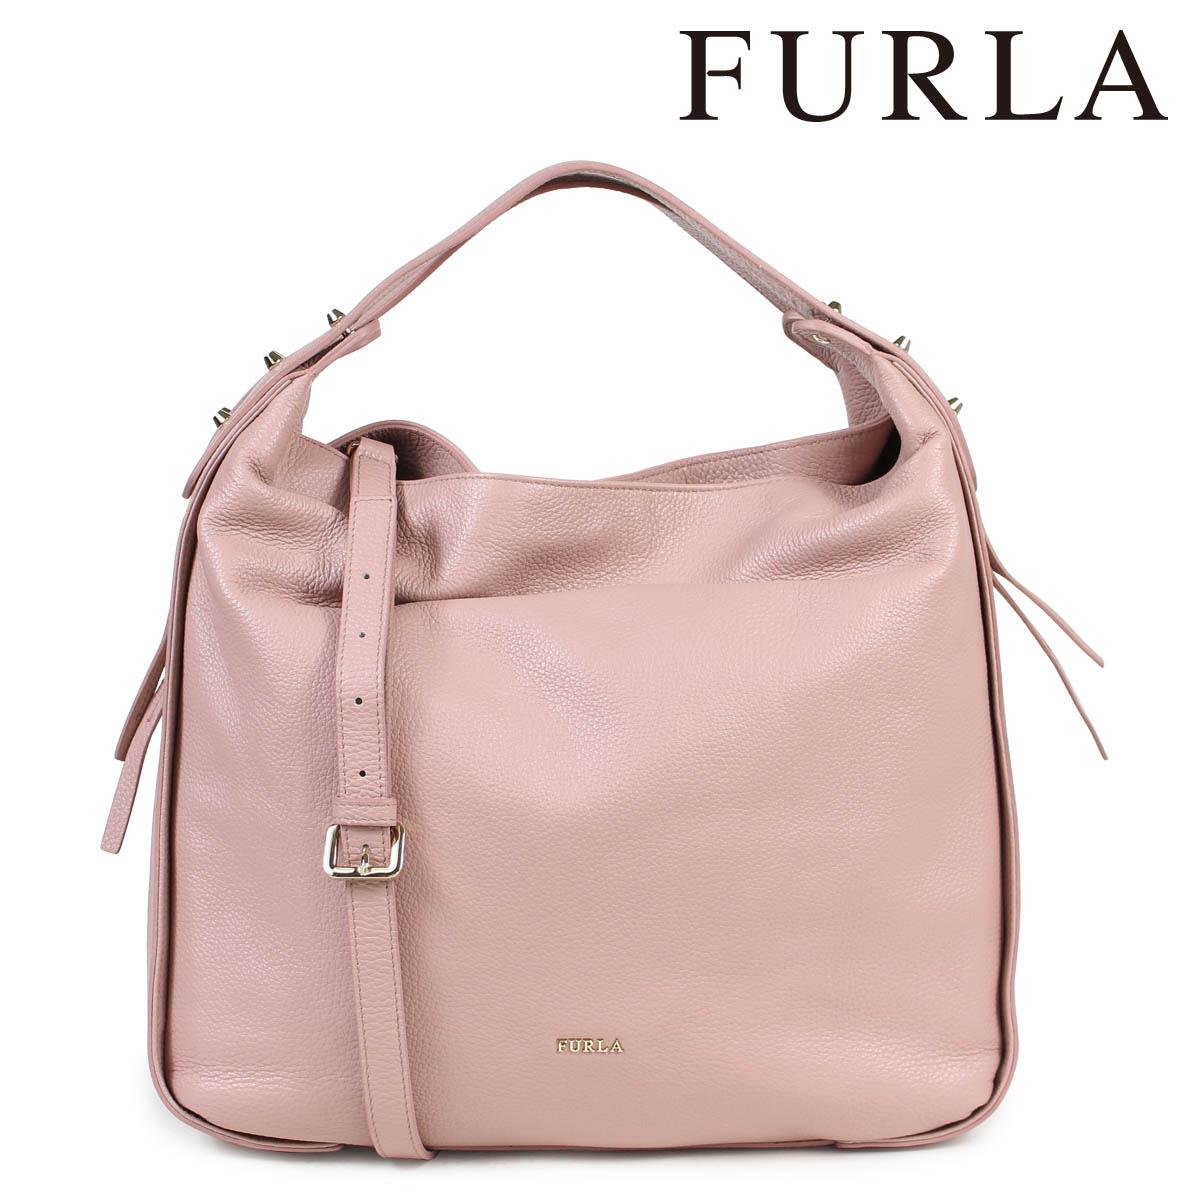 FURLA フルラ バッグ ショルダーバッグ レディース ピンク 2WAY SHOULDER BAG 827671 【決算セール 返品不可】